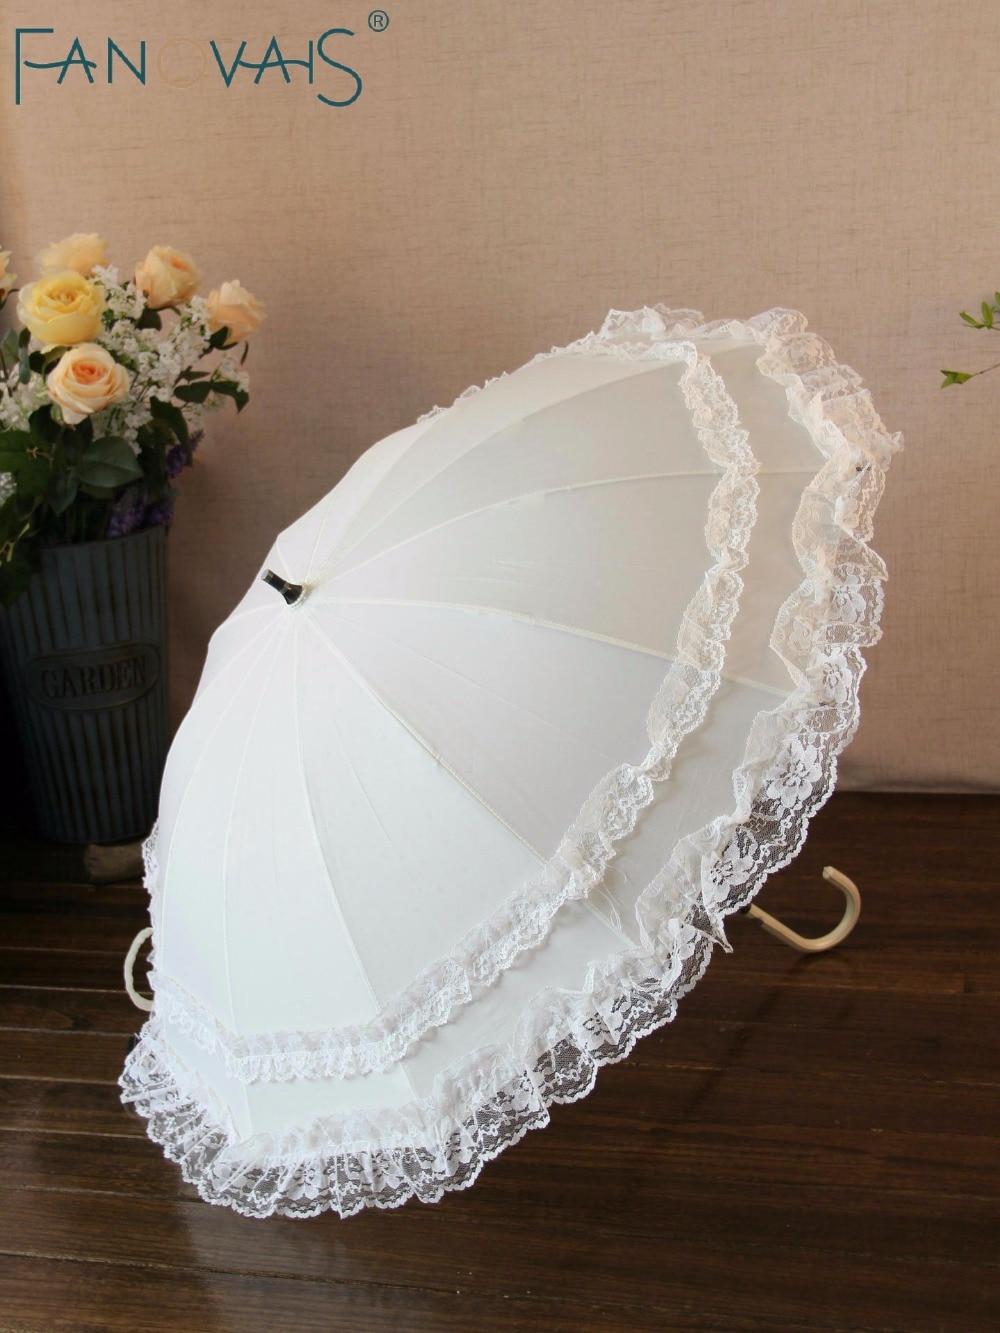 Aliexpresscom  Buy Lace Parasol Sun Lace Umbrella Vintage Style Handmade Umbrellas Wedding